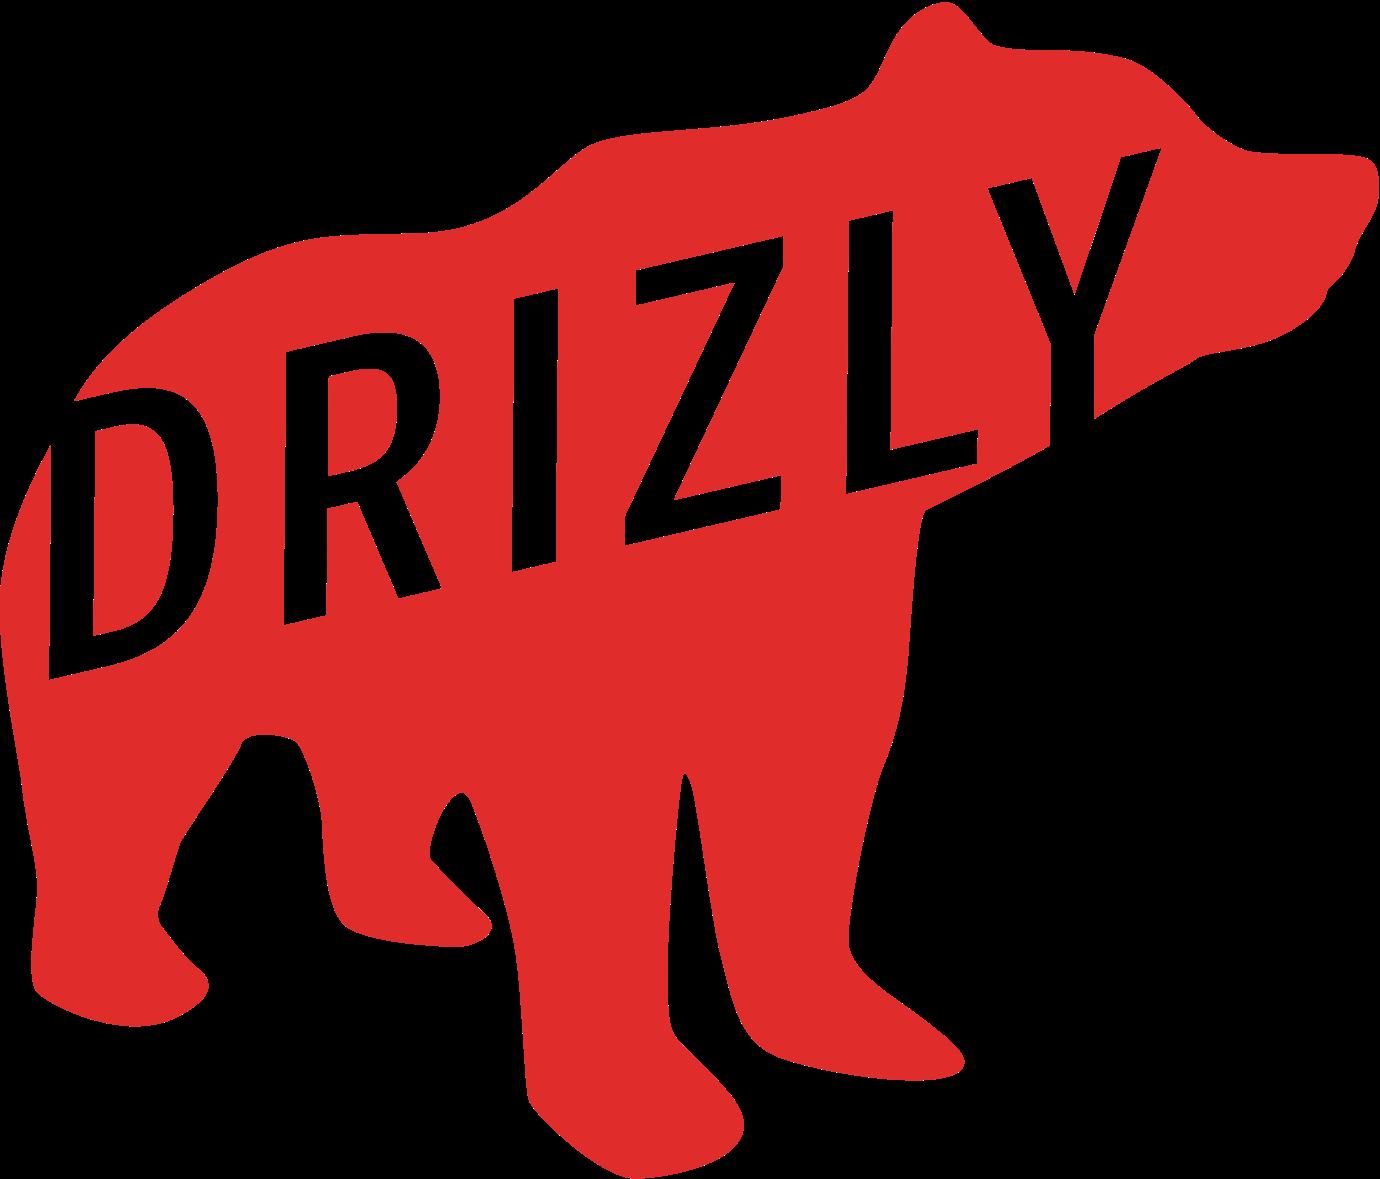 DrizlyLogo